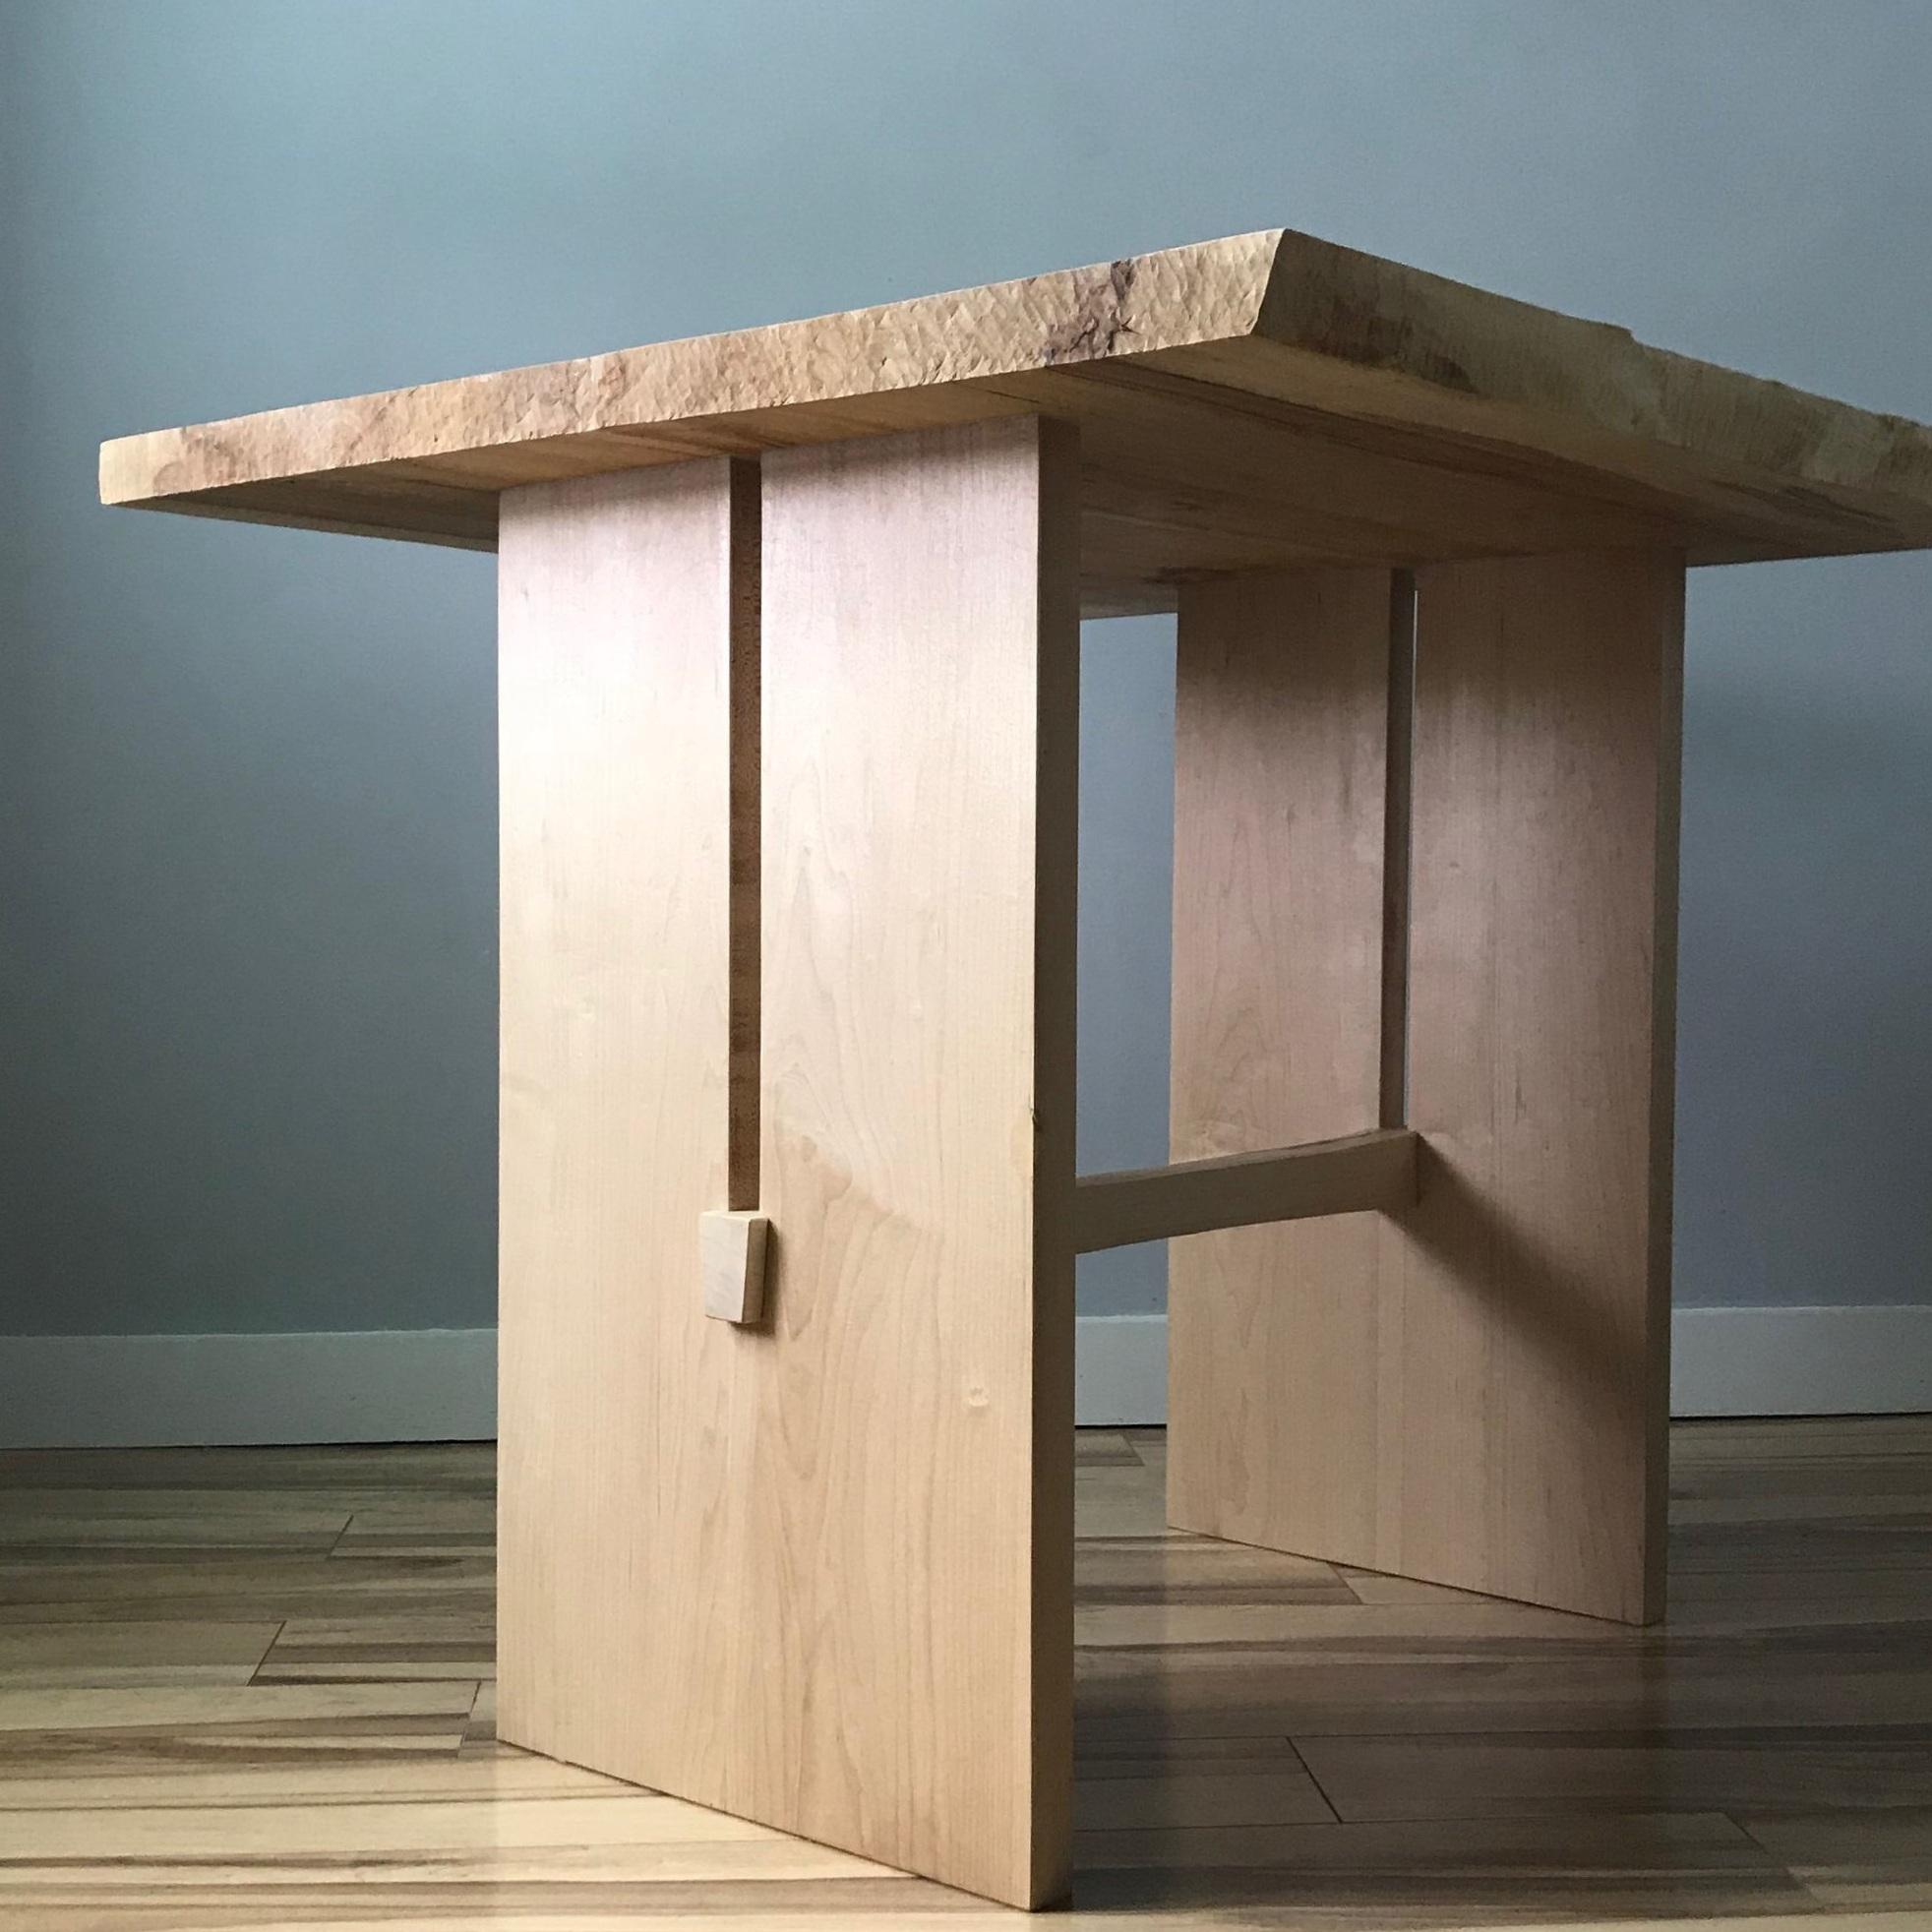 mizu table_front elevation angled.jpg